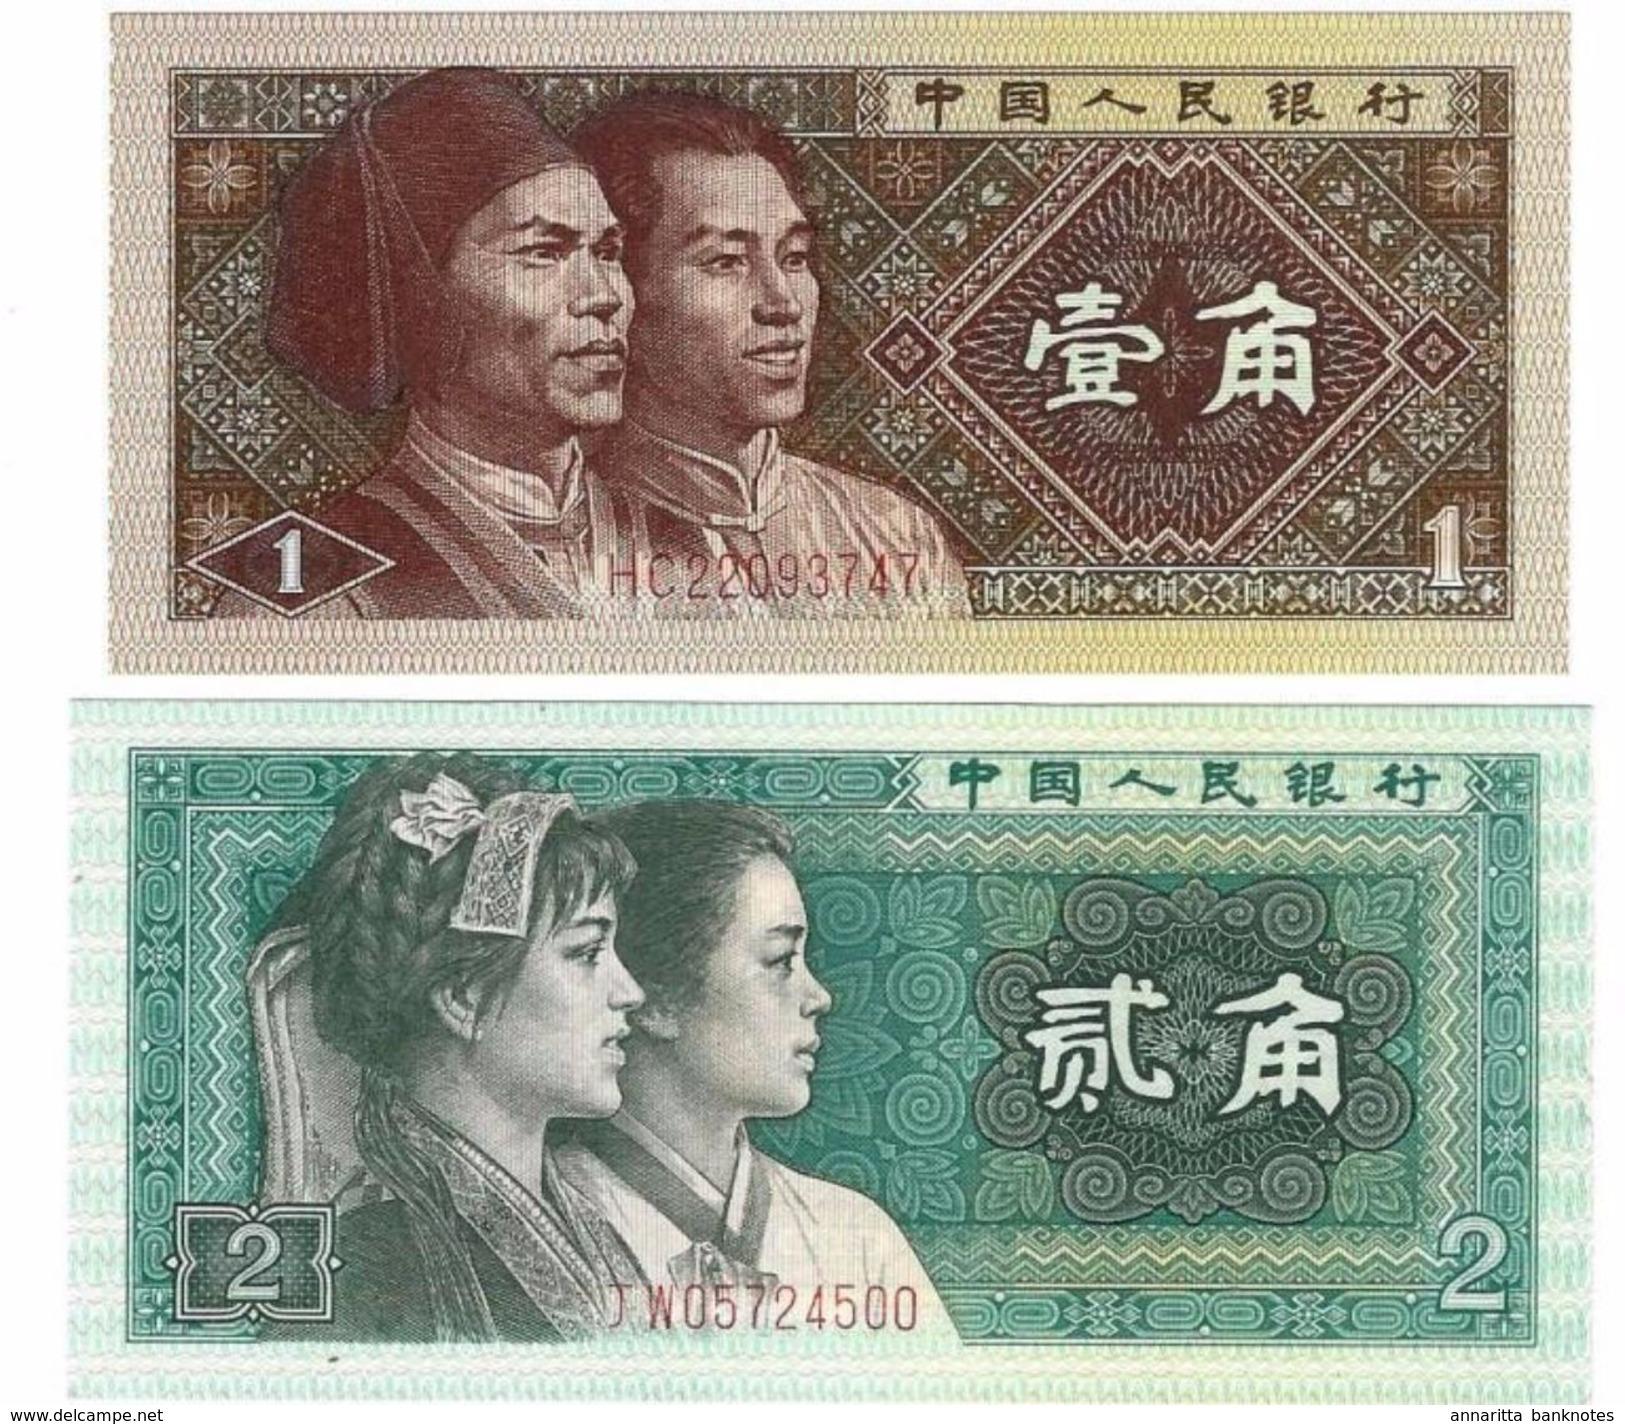 CHINA 1 & 2 JIAO 1980 P-881, 882 I (BFR) SET [CN4094a-4095a] - China